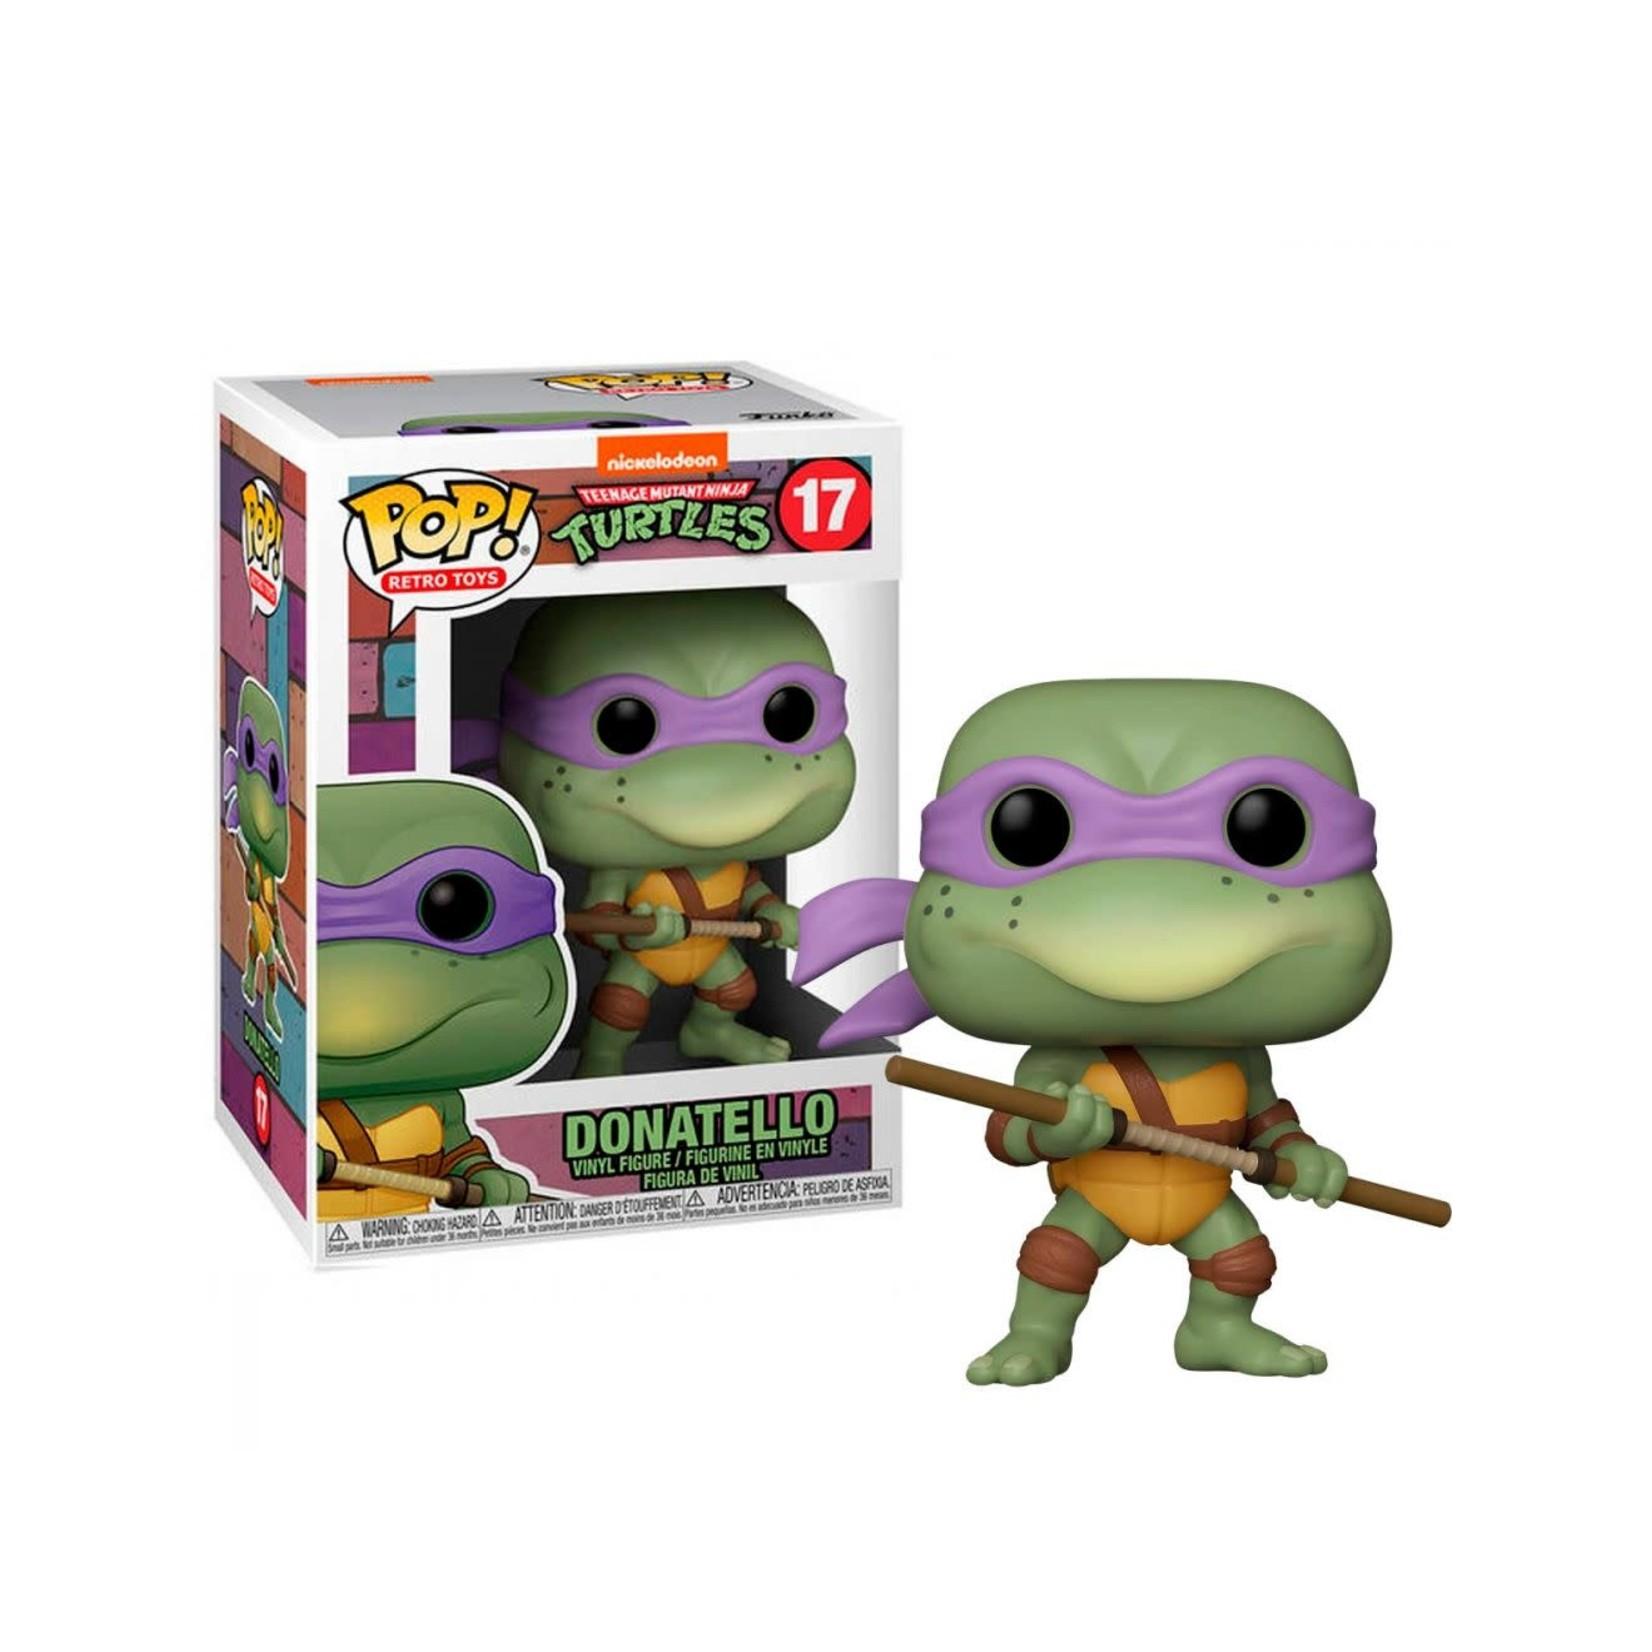 Funko Pop ! Retro Toys - TMNT Donatello